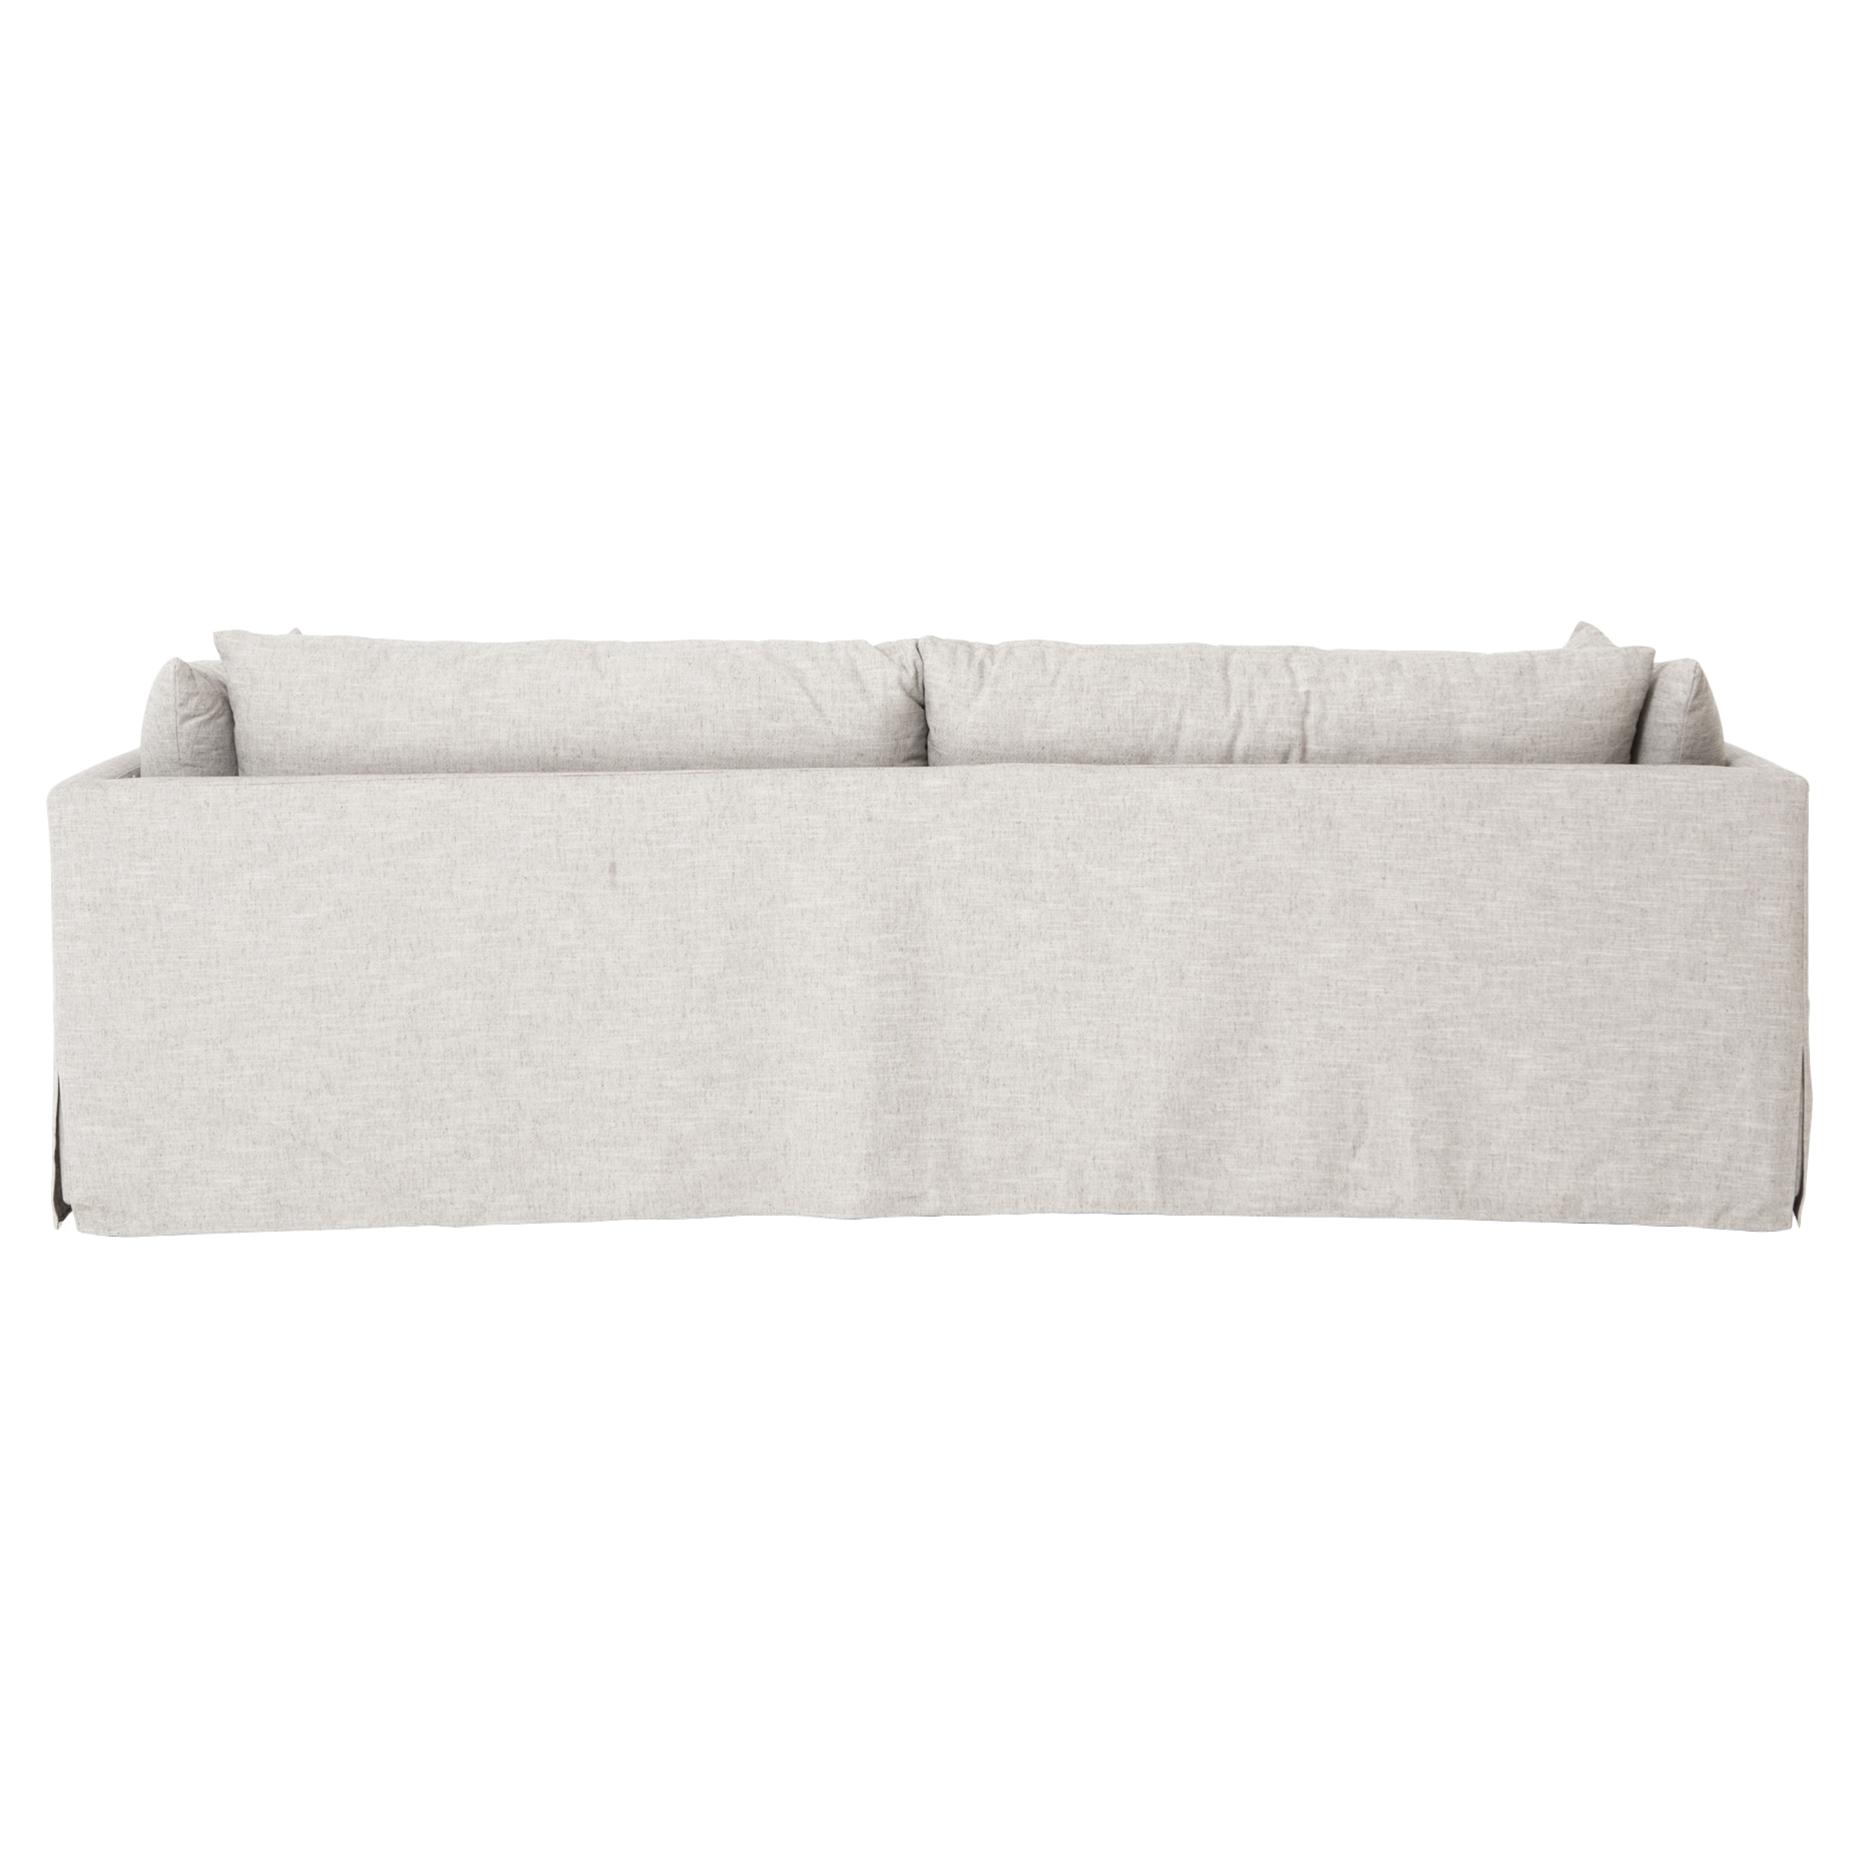 "Alexa Modern Classic Light Grey Upholstered Sofa - 90"""